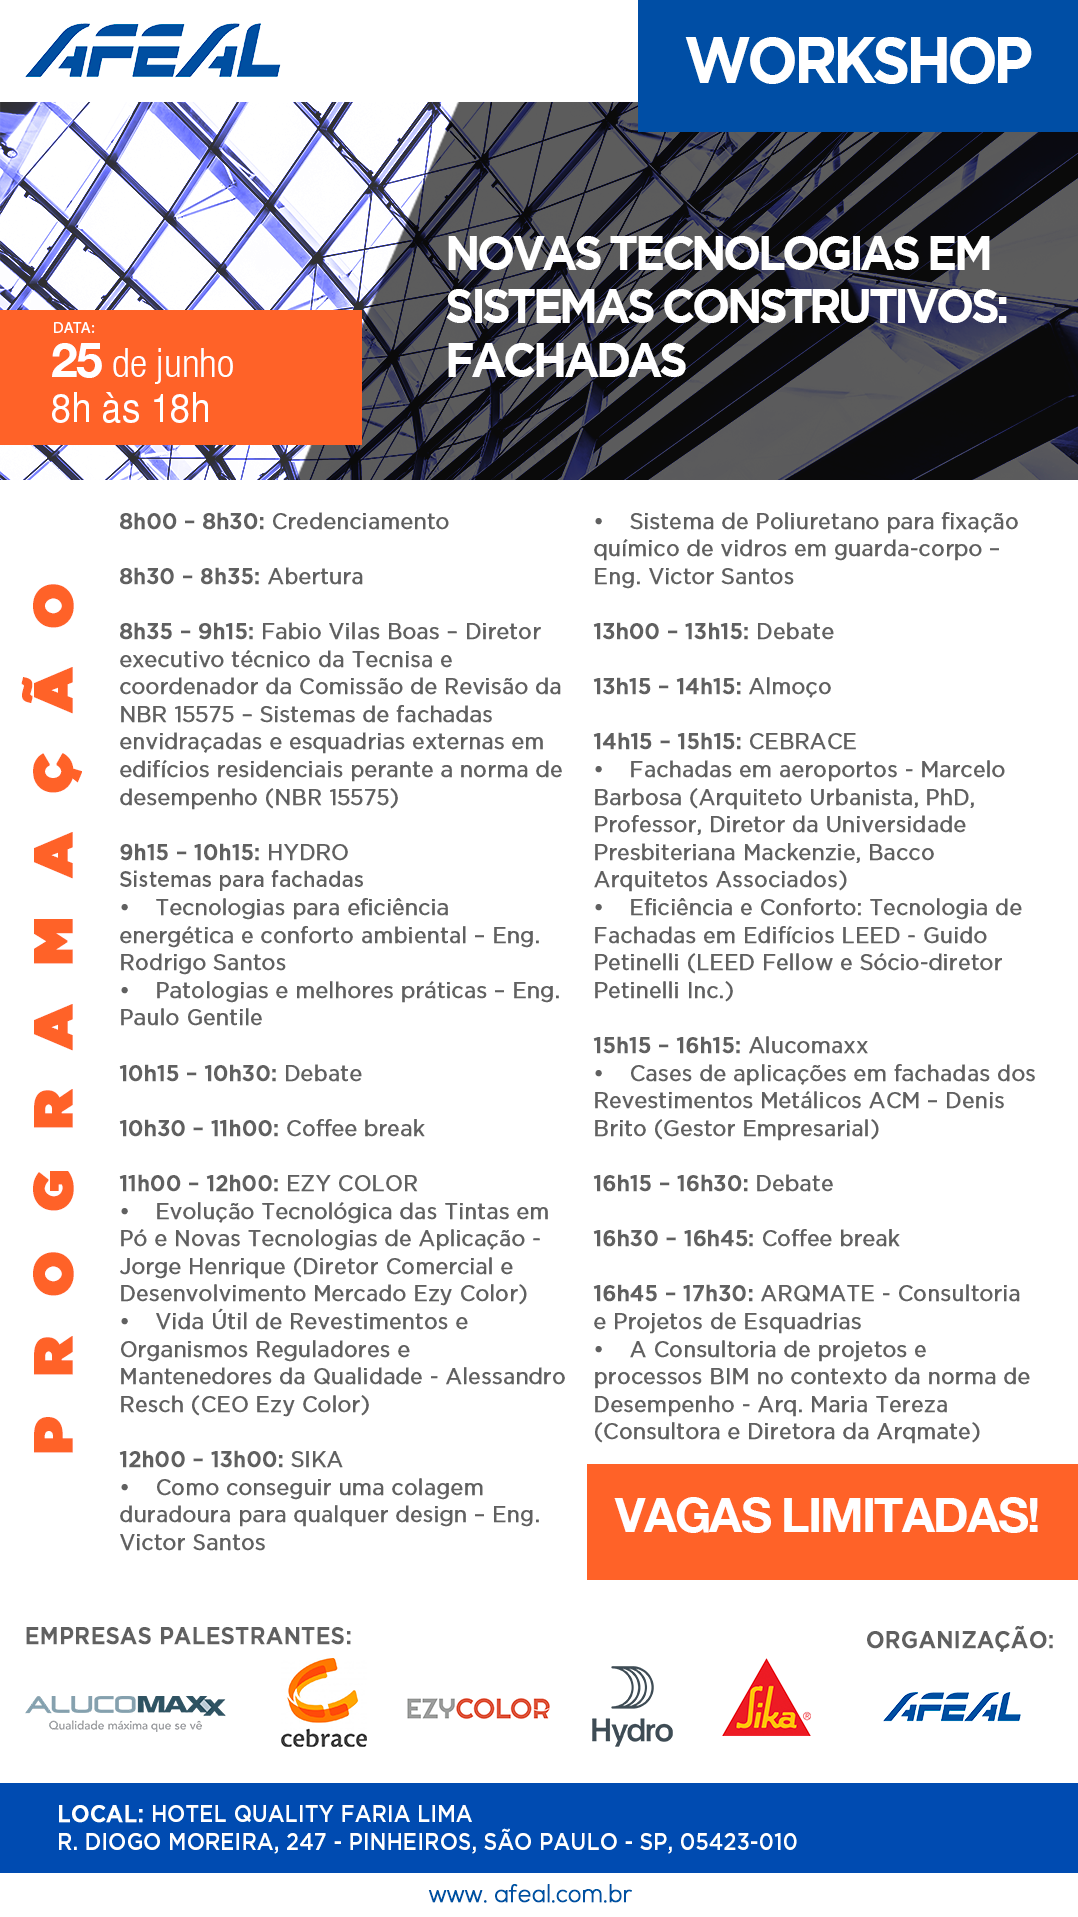 2019_0604_workshop_novas-tecnologias-programação.jpg